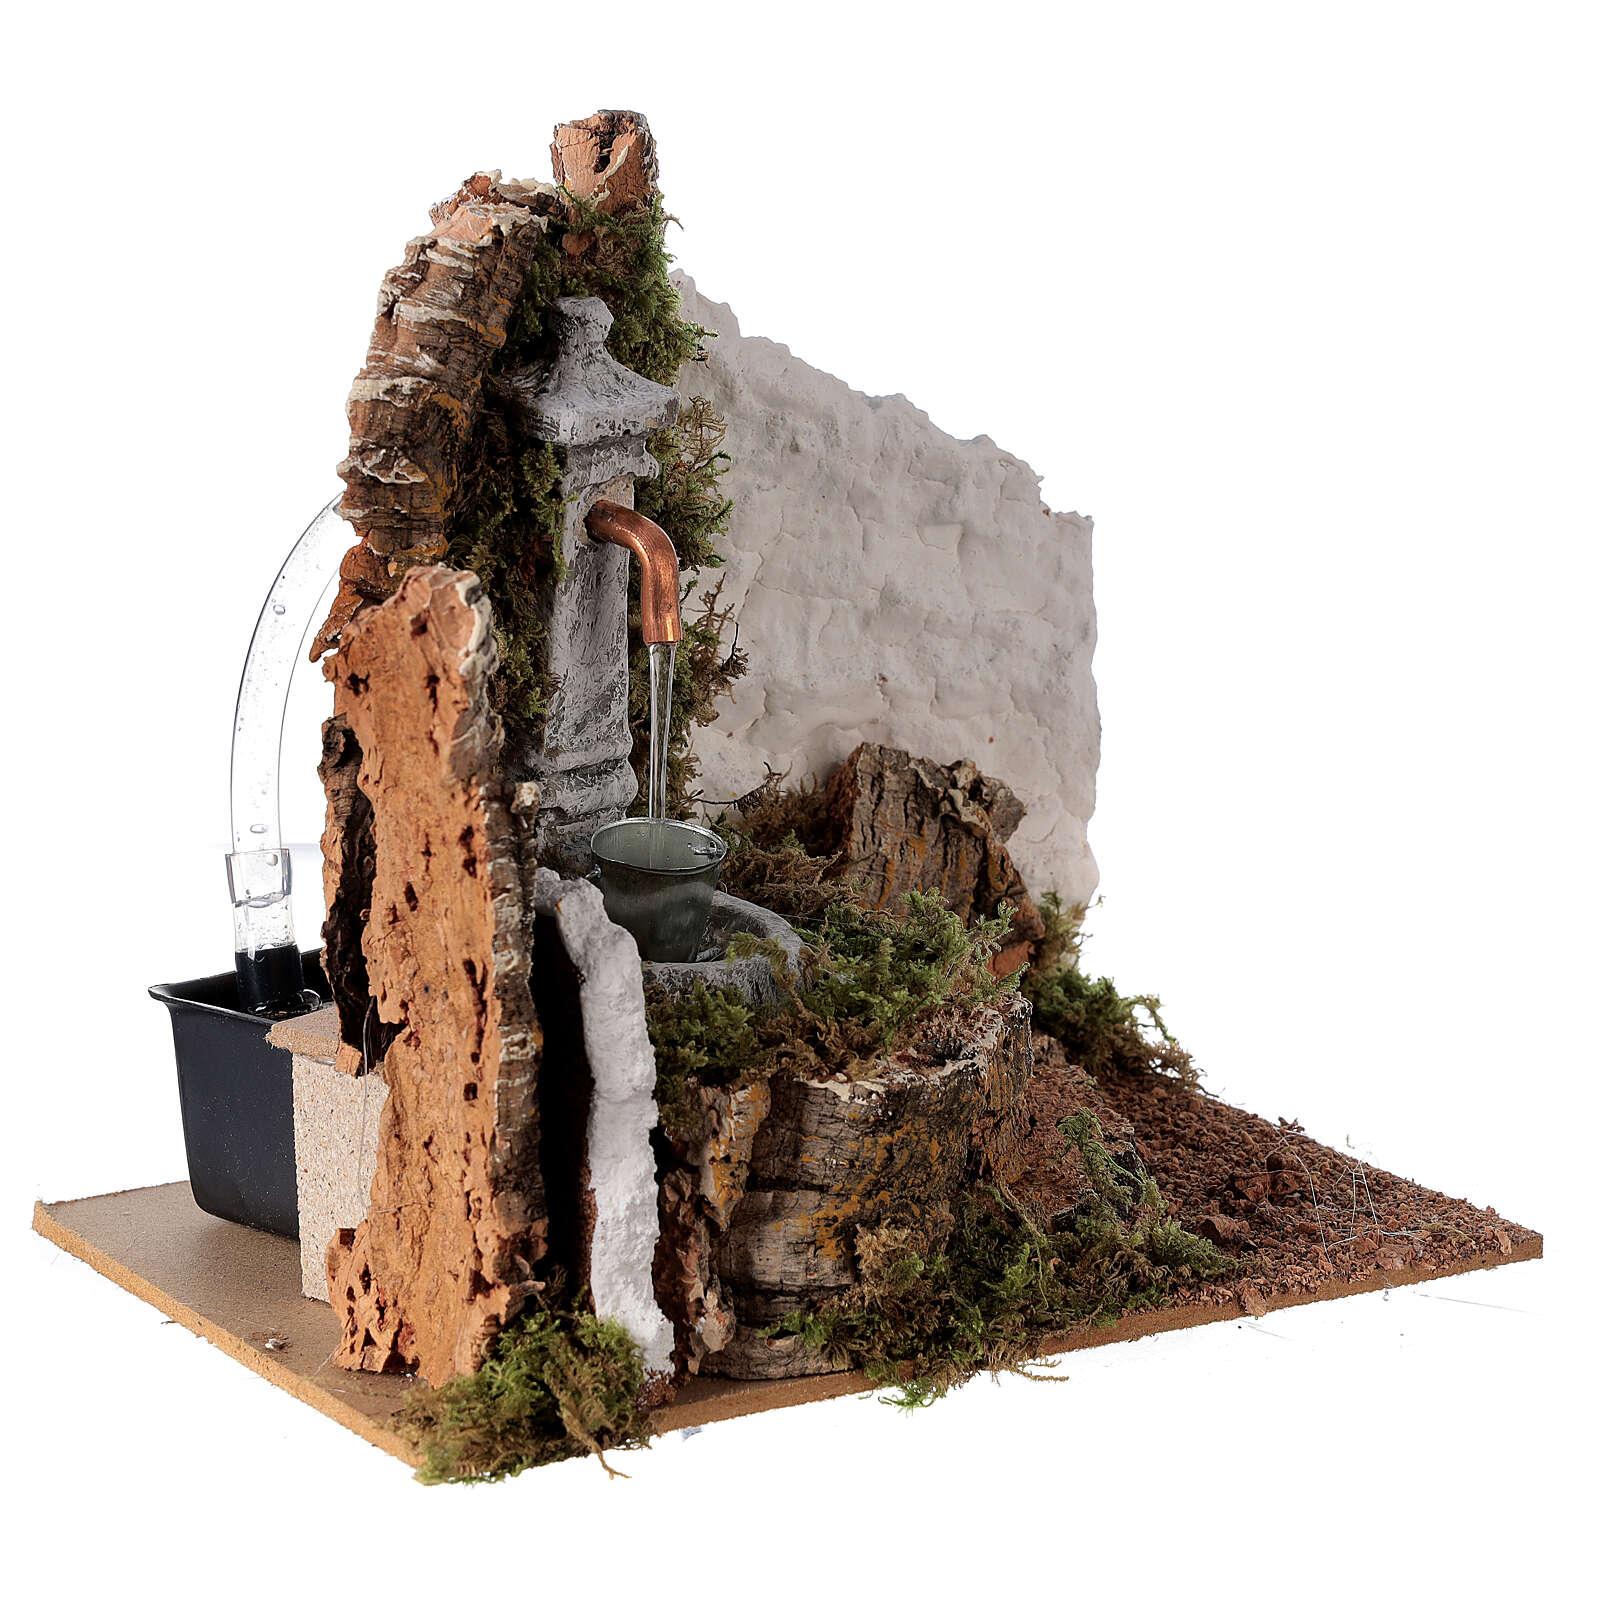 Fountain with bucket 20x20x15 cm for Nativity scene 8-10 cm 4